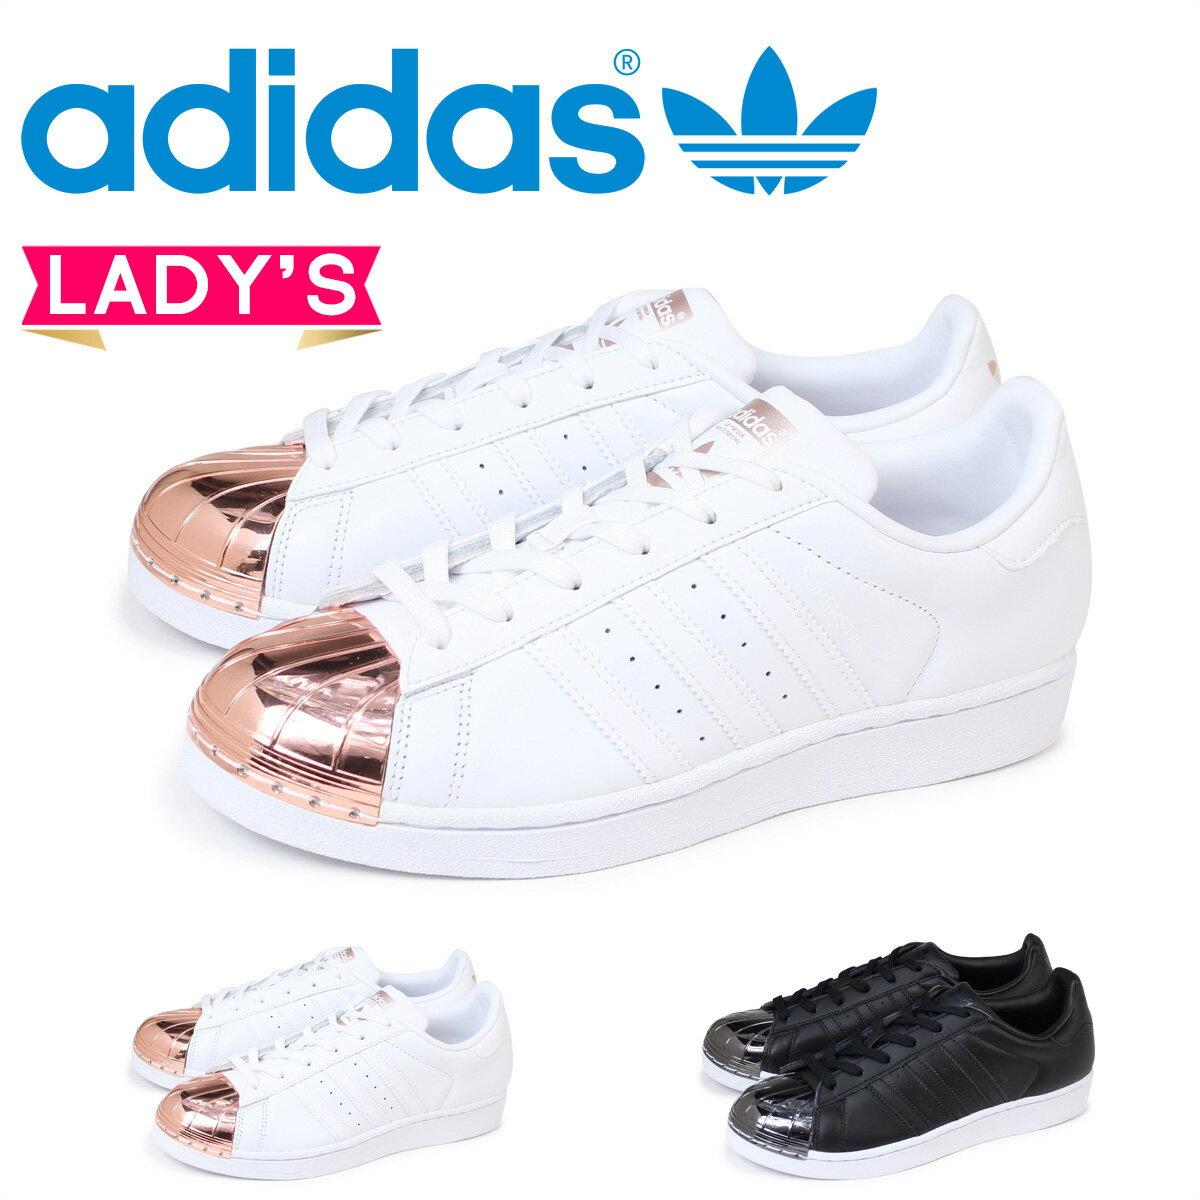 adidas スーパースター レディース スニーカー アディダス Originals SUPERSTAR METAL TOE W BY2882 BY2883 靴 ホワイト ブラック オリジナルス